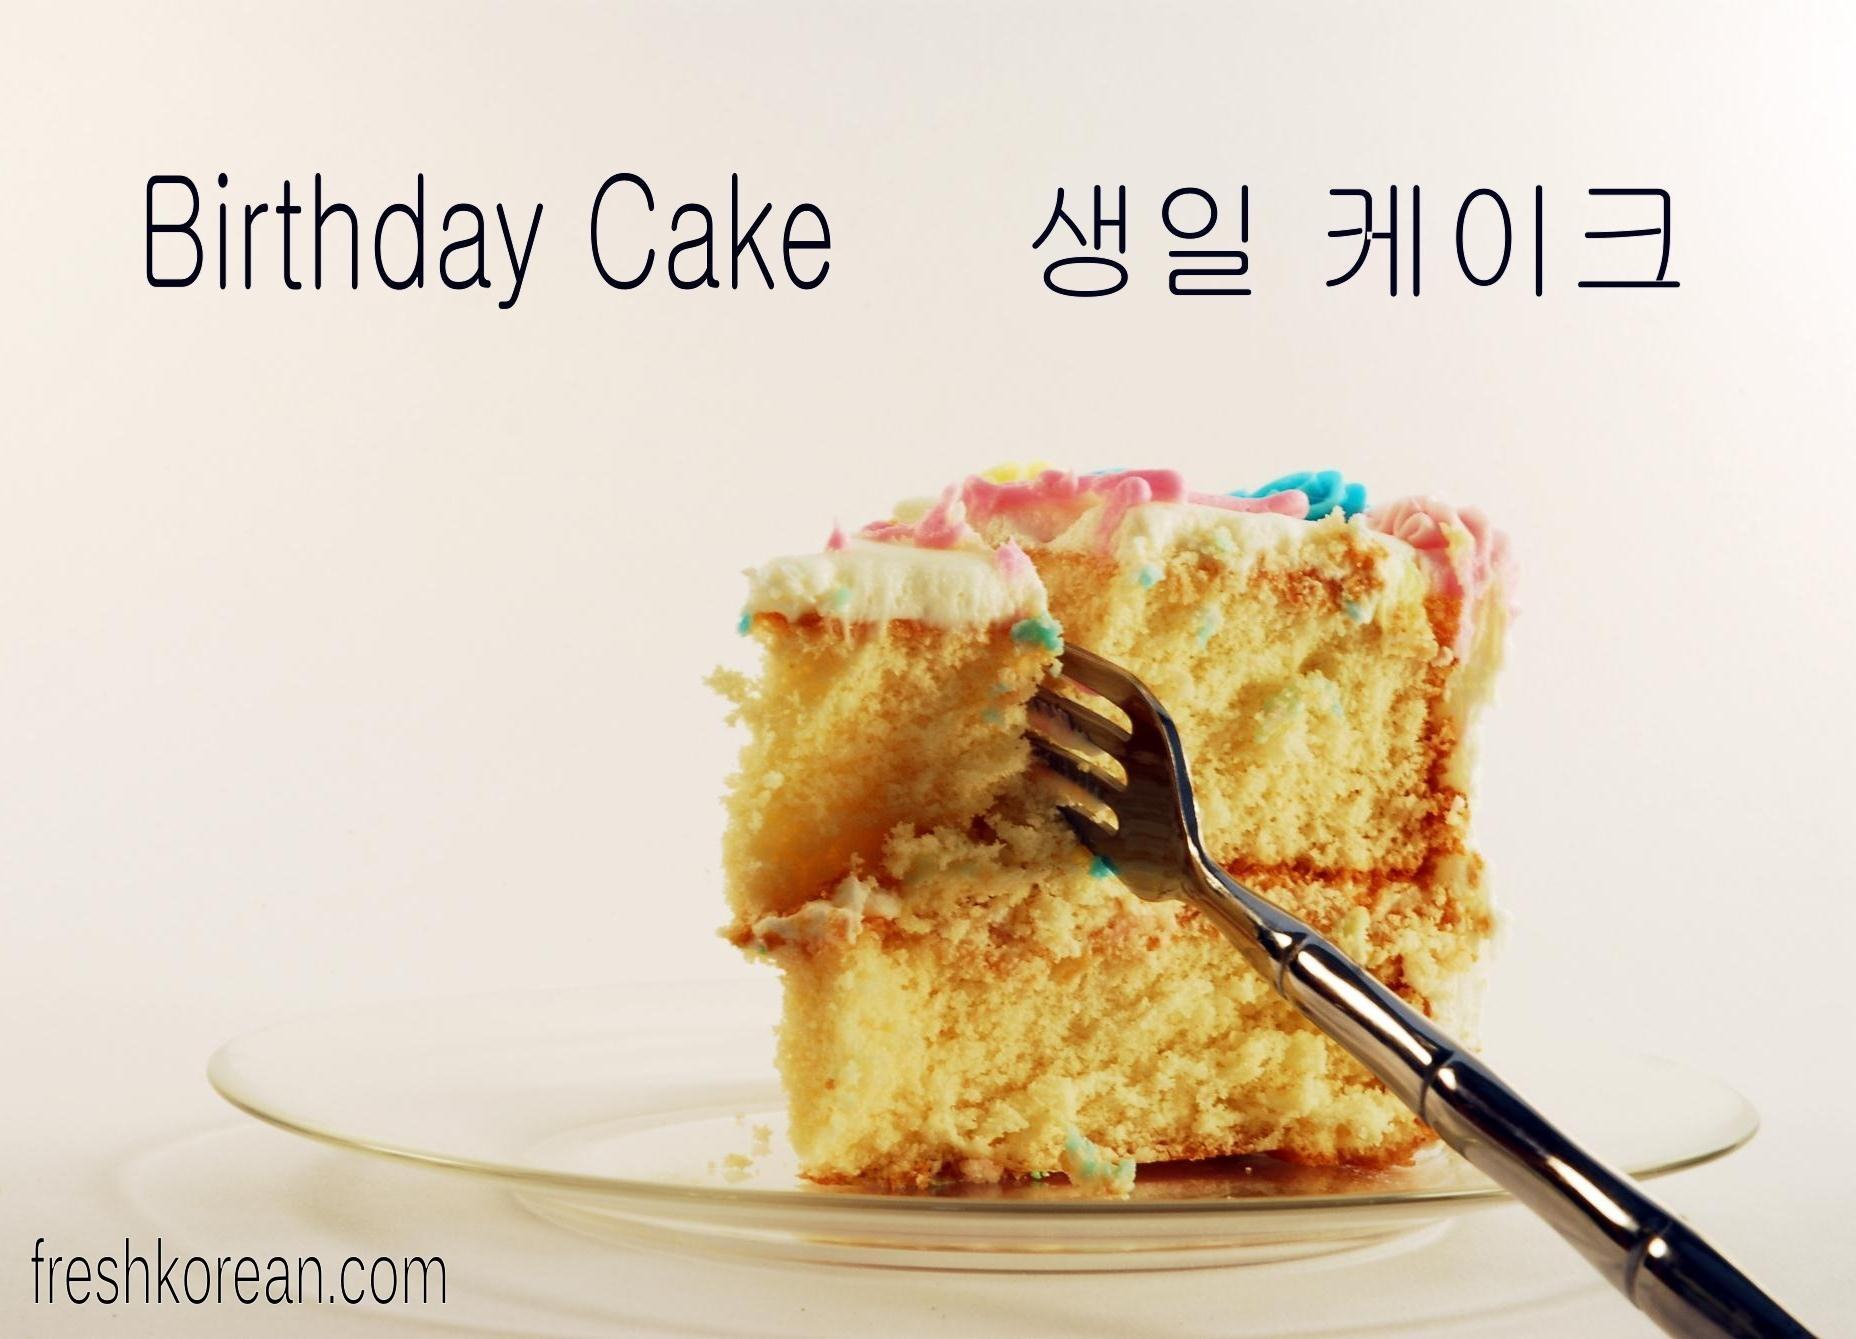 Birthday Cake Fresh Korean